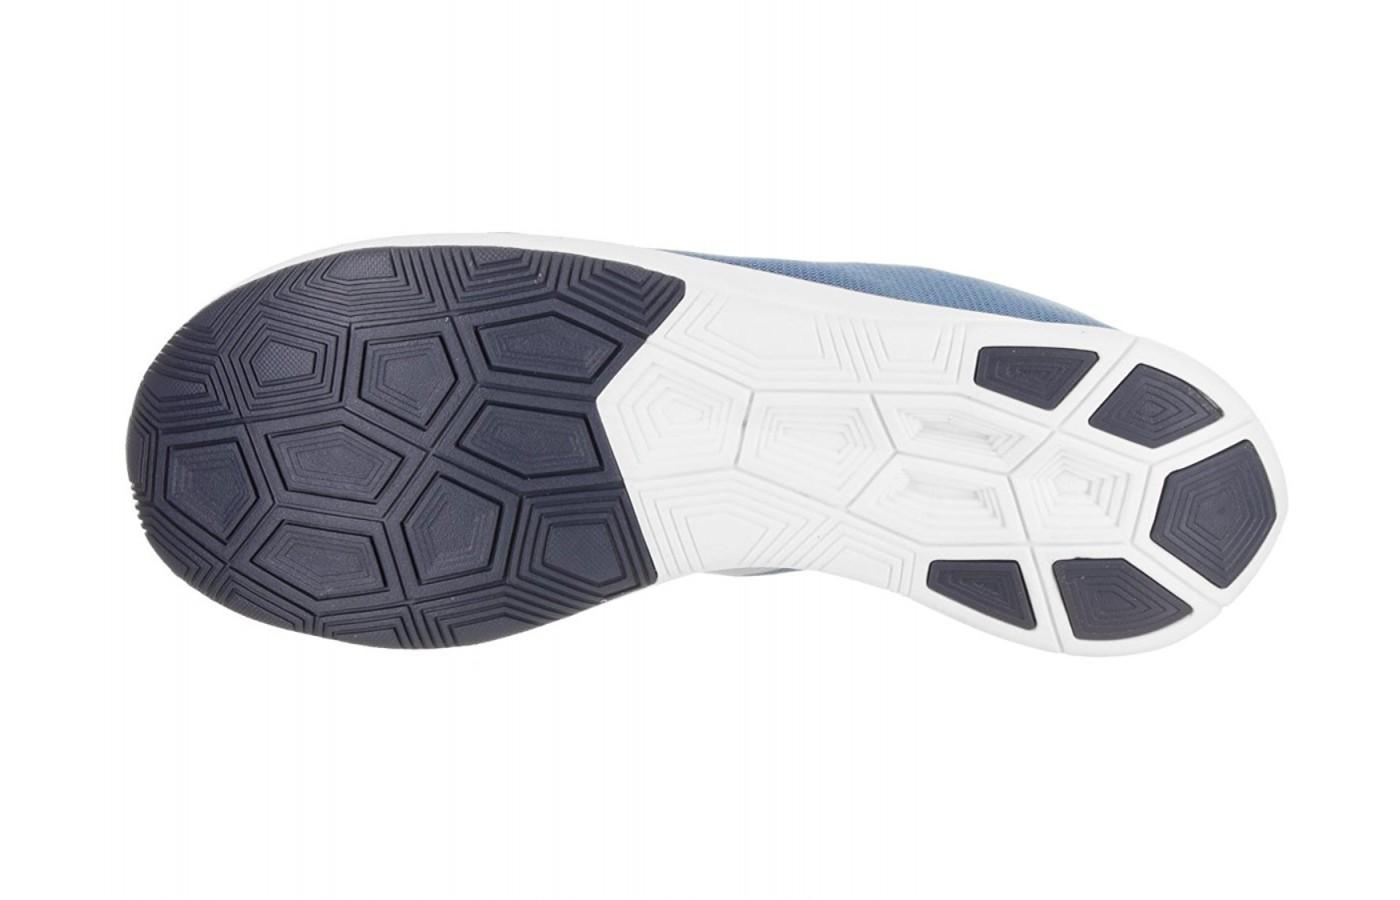 Nike Zoom Fly sole